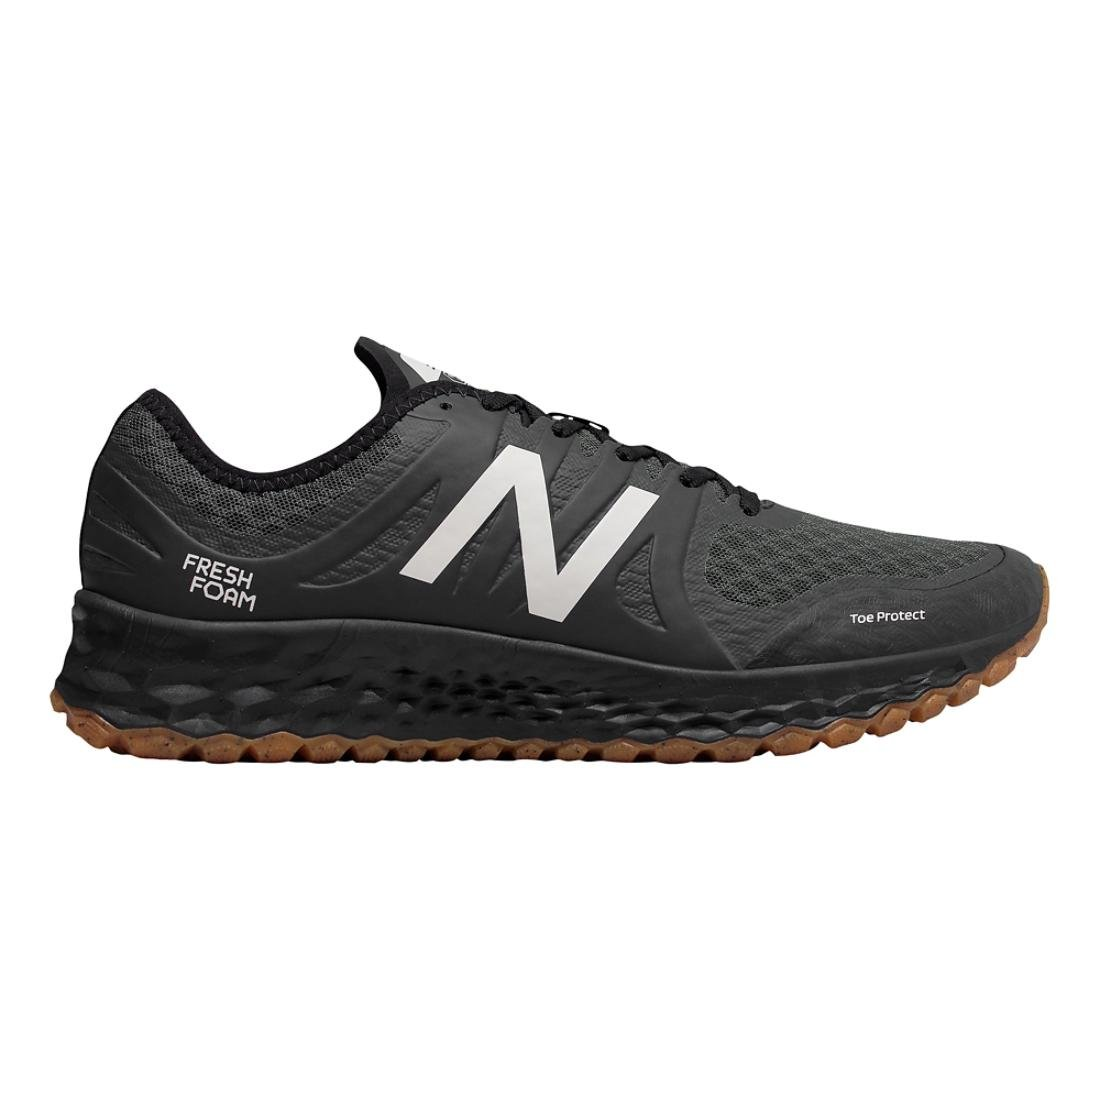 New Balance Men's Kaymin Trail v1 Fresh Foam Trail Running Shoe, Black, 12 D US by New Balance